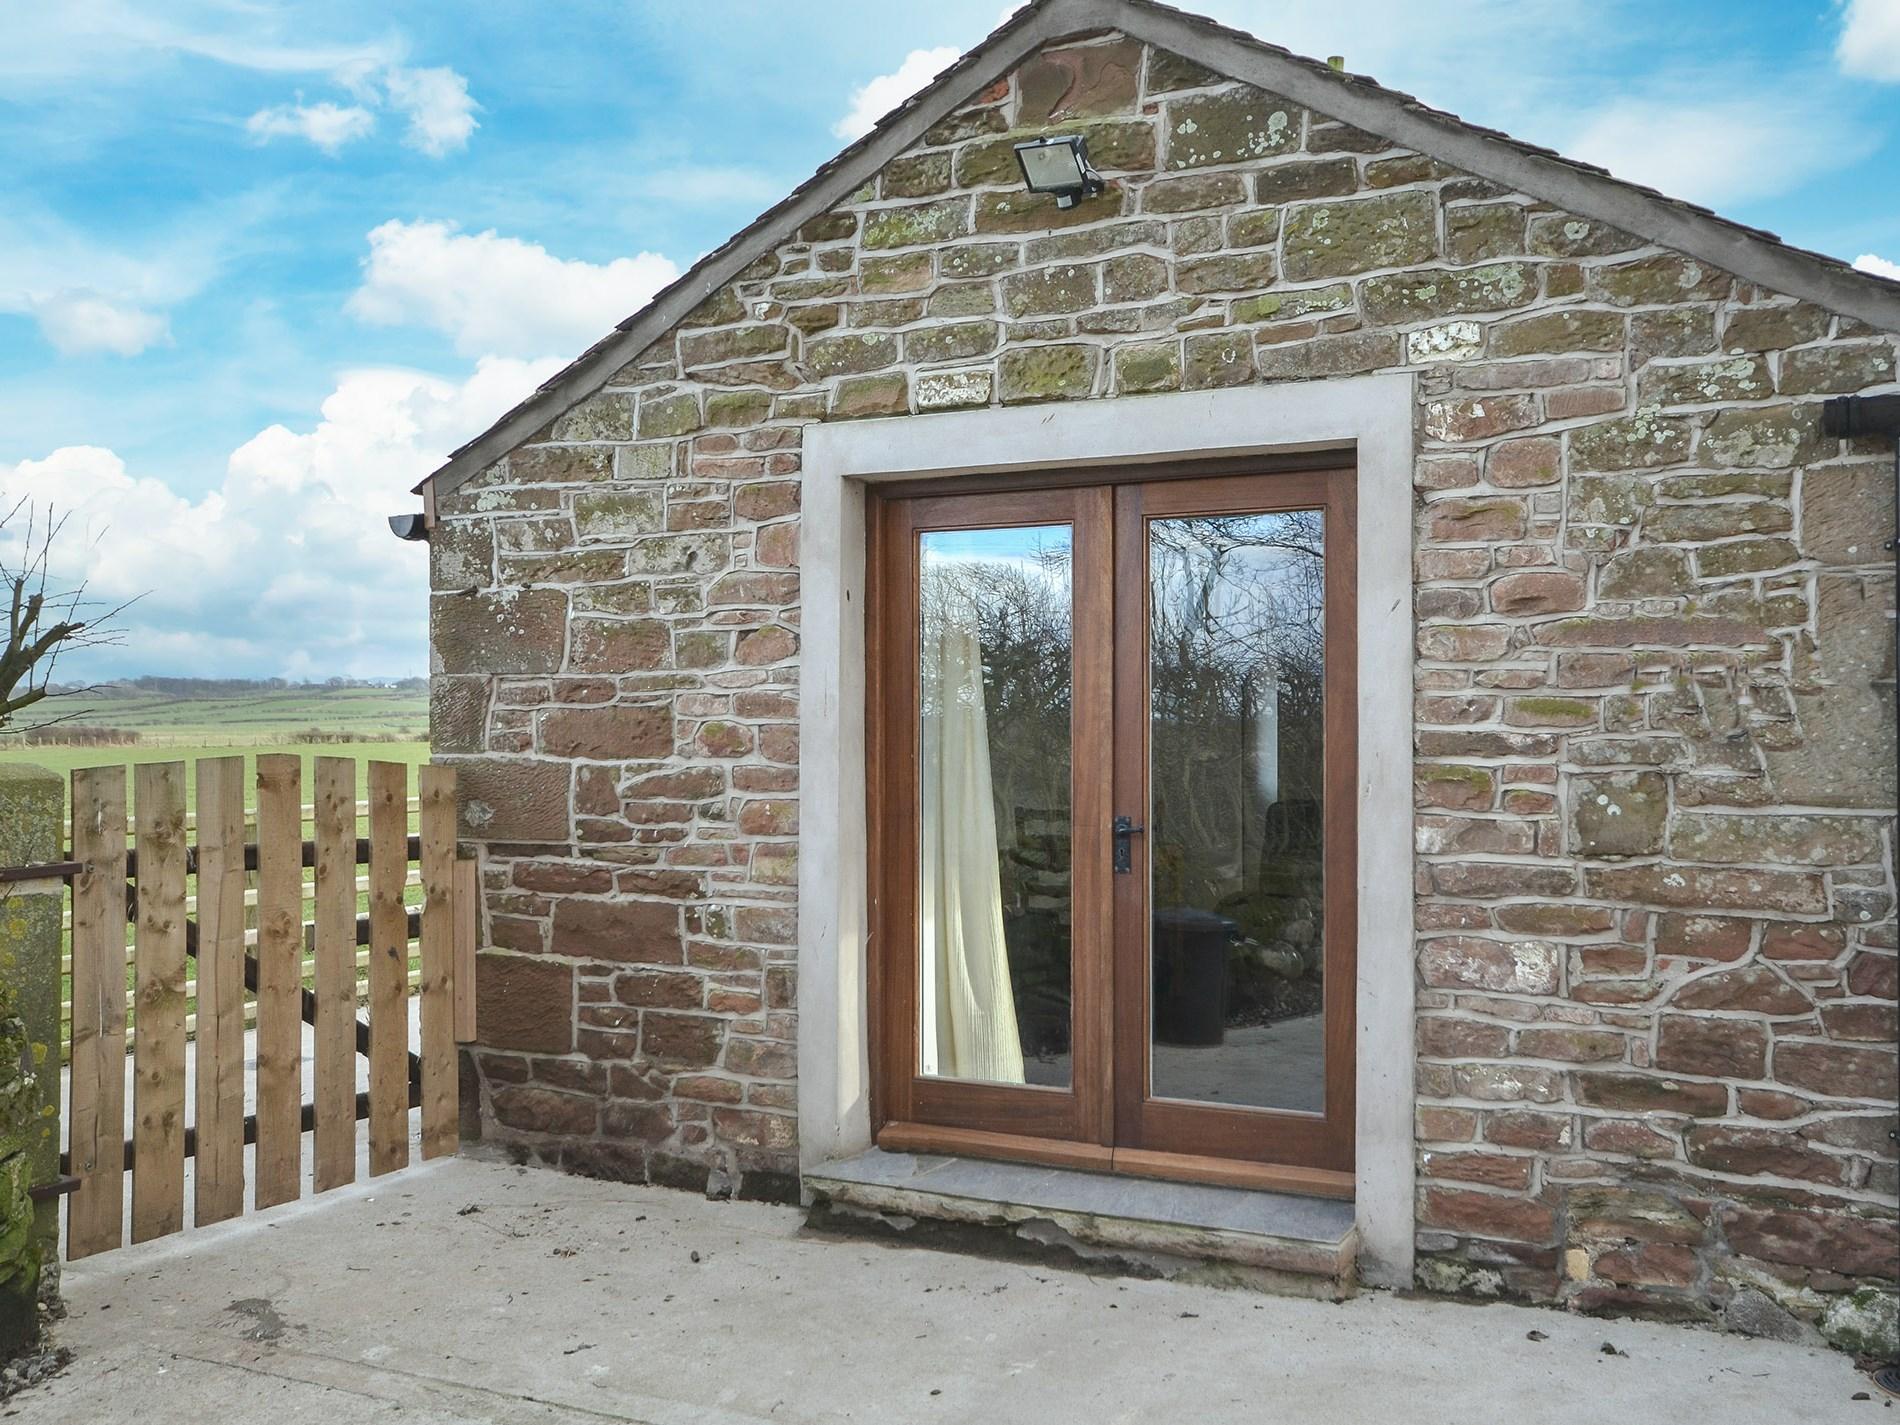 1 Bedroom Barn in Cumbria, Scottish Borders